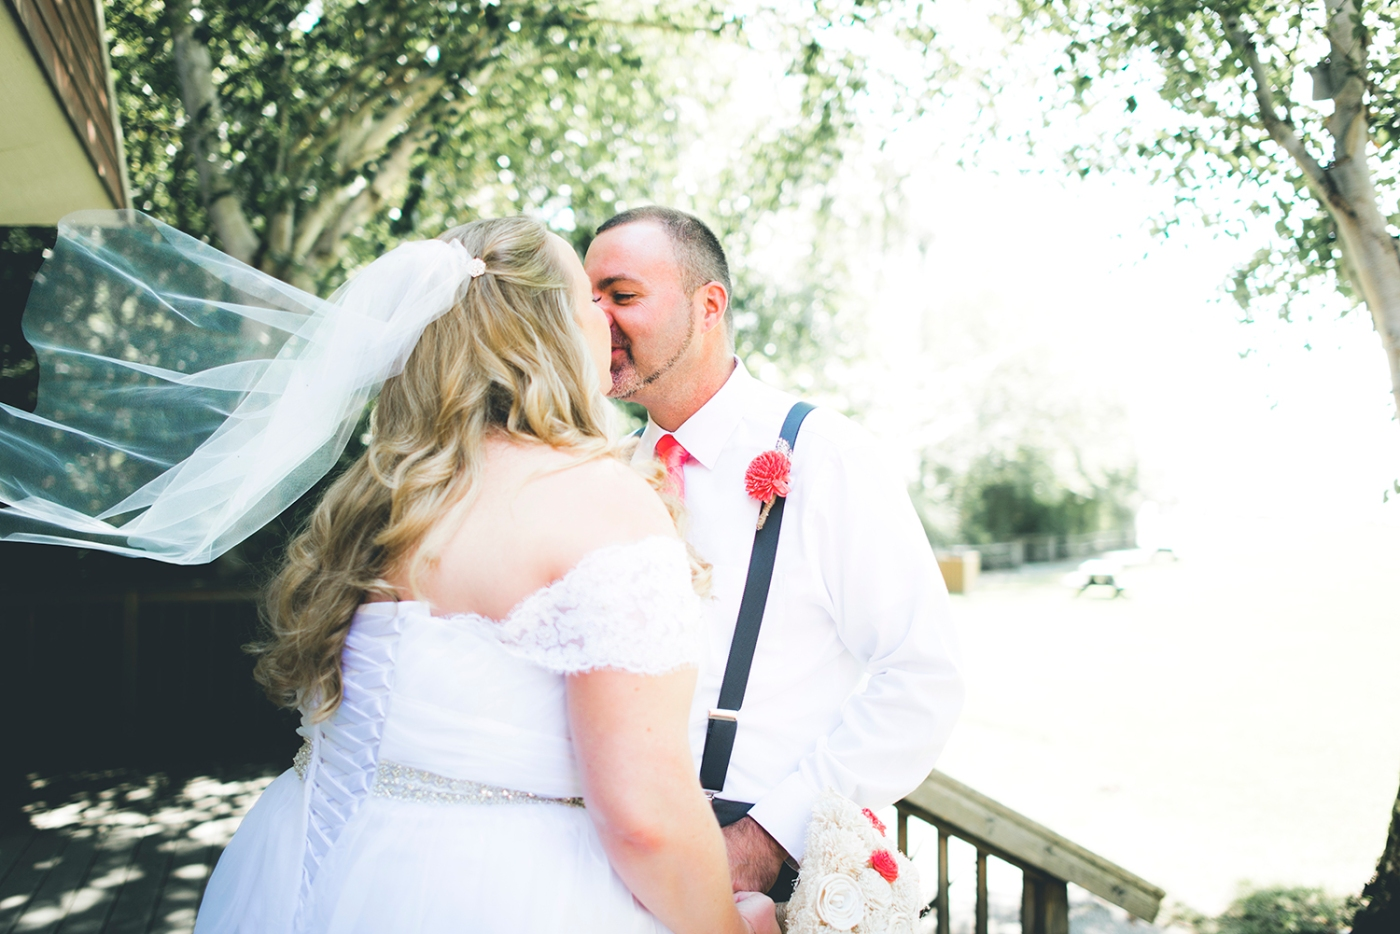 Jane_S_photography_Kadie_and_Steve_2016_Des_Moines_Marina_WeddingDSC_1518